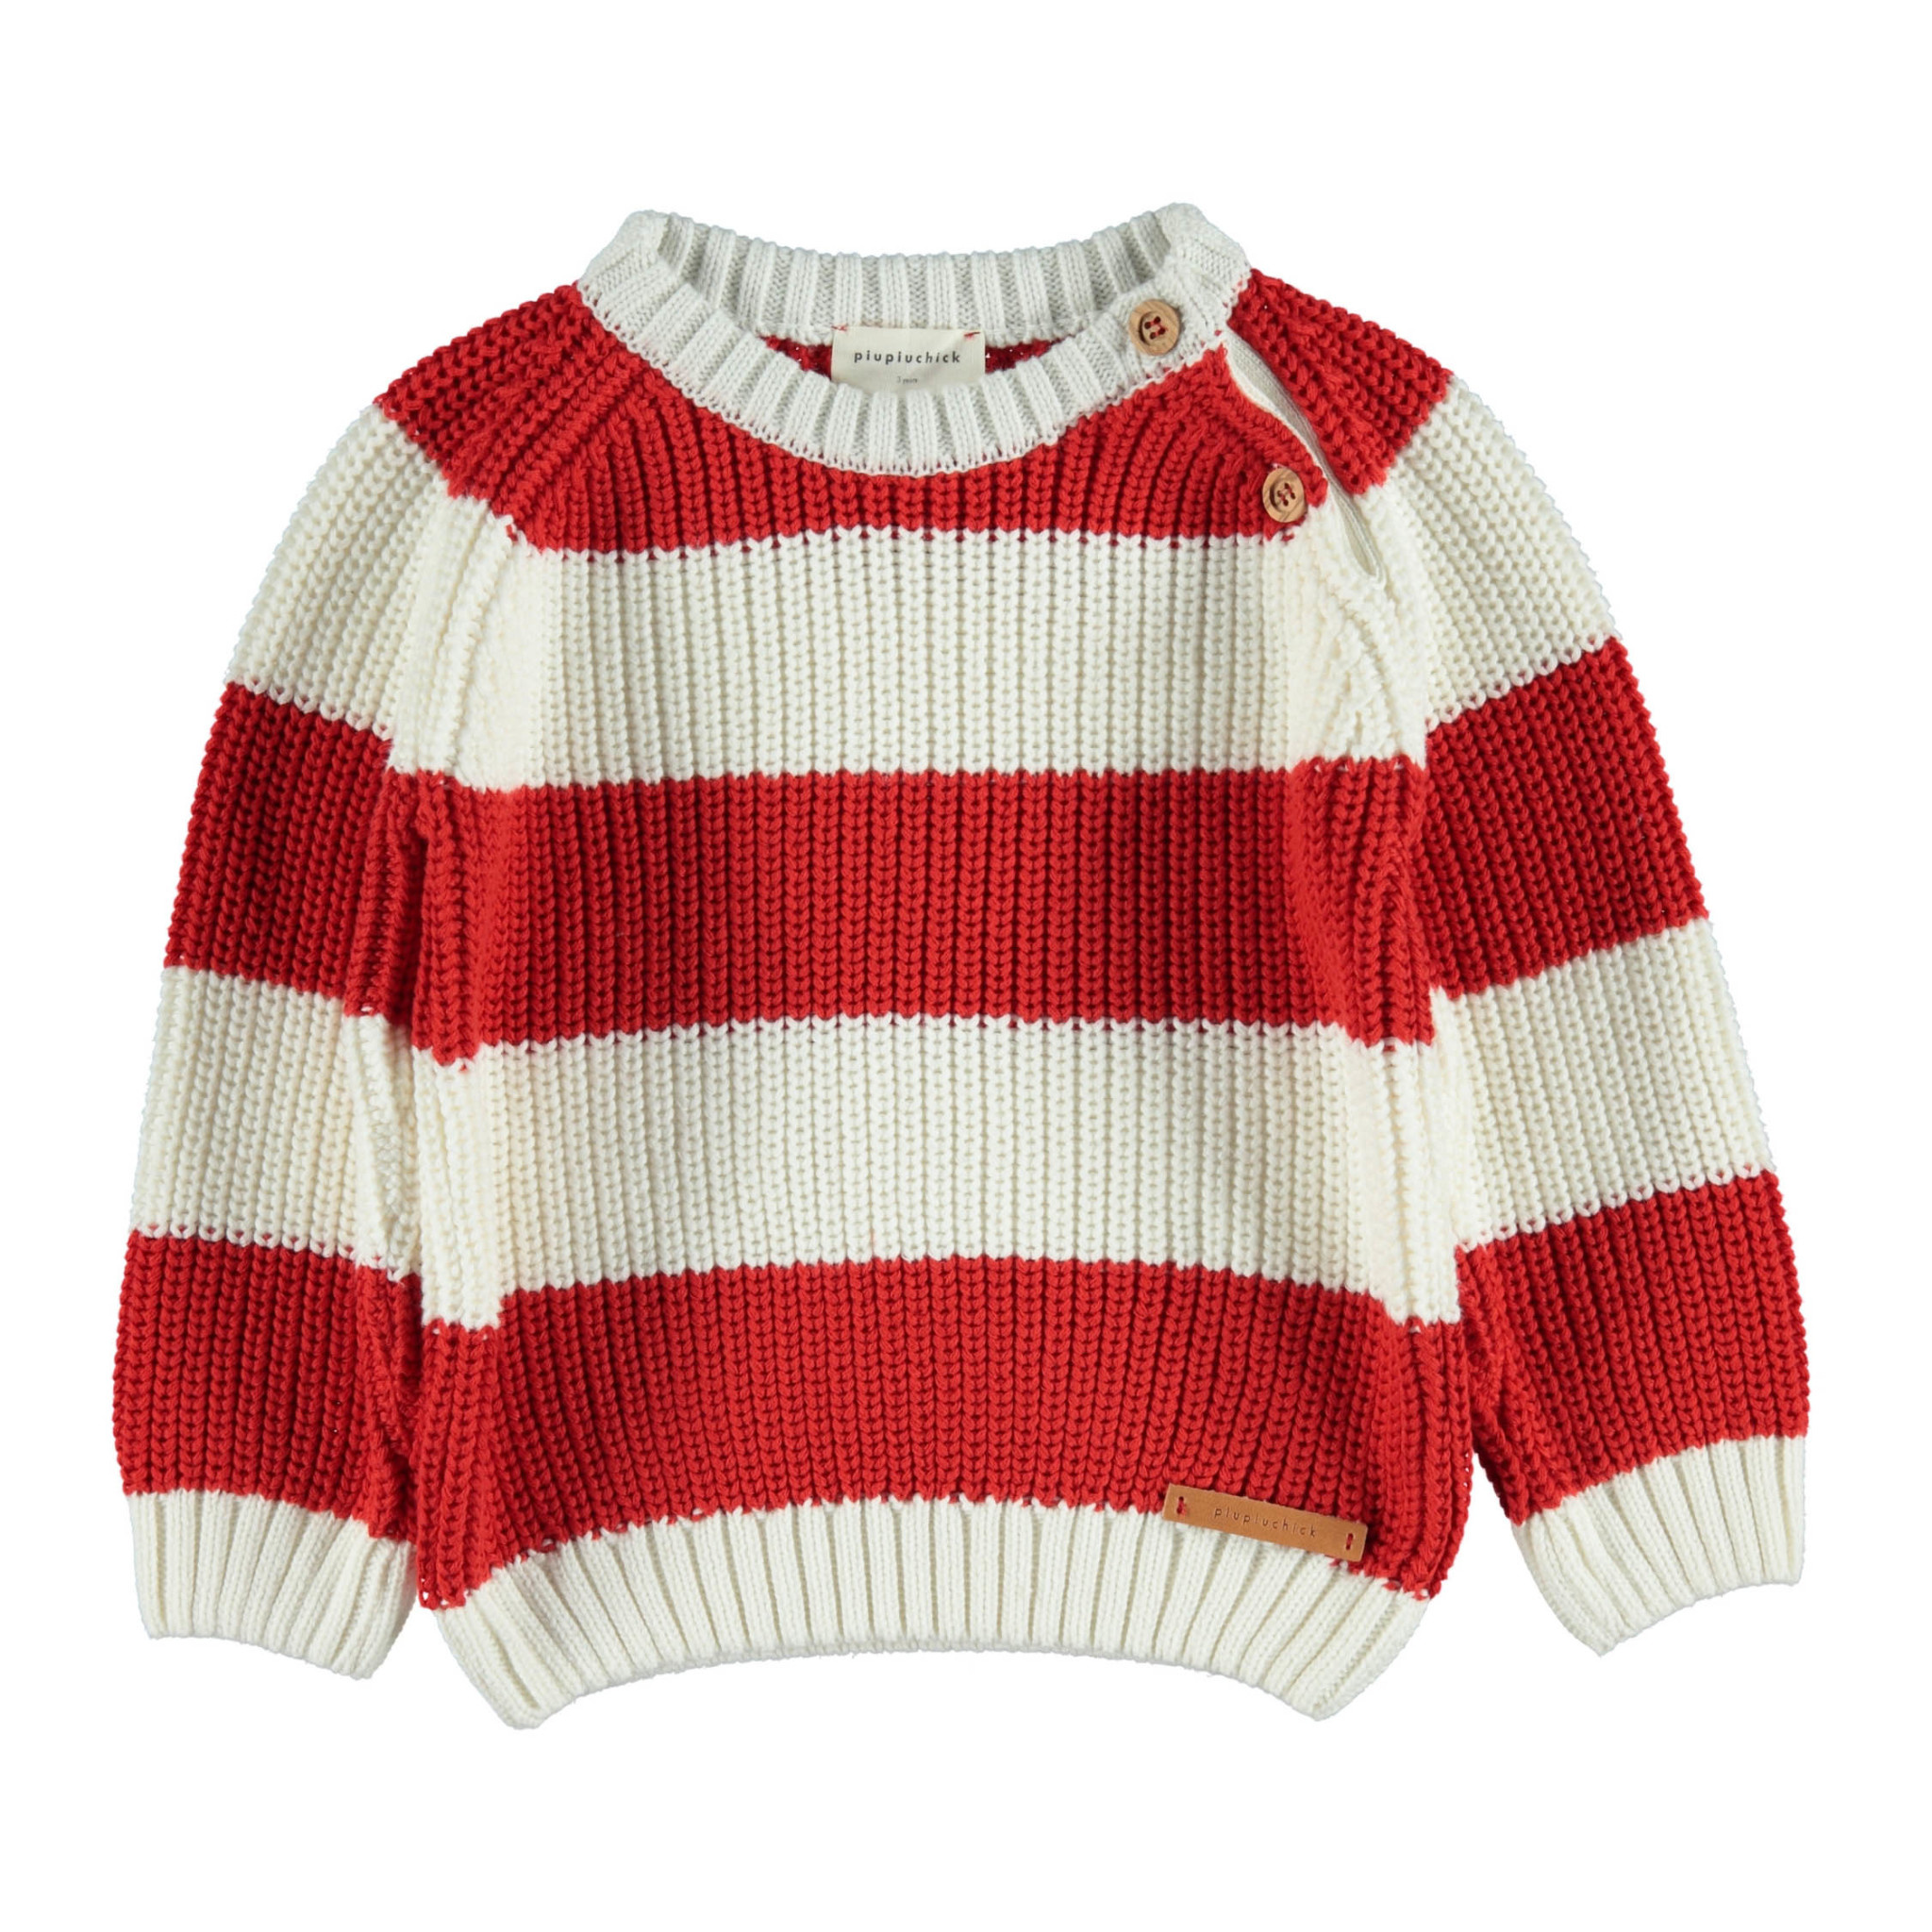 piupiuchick Knitted sweater red white